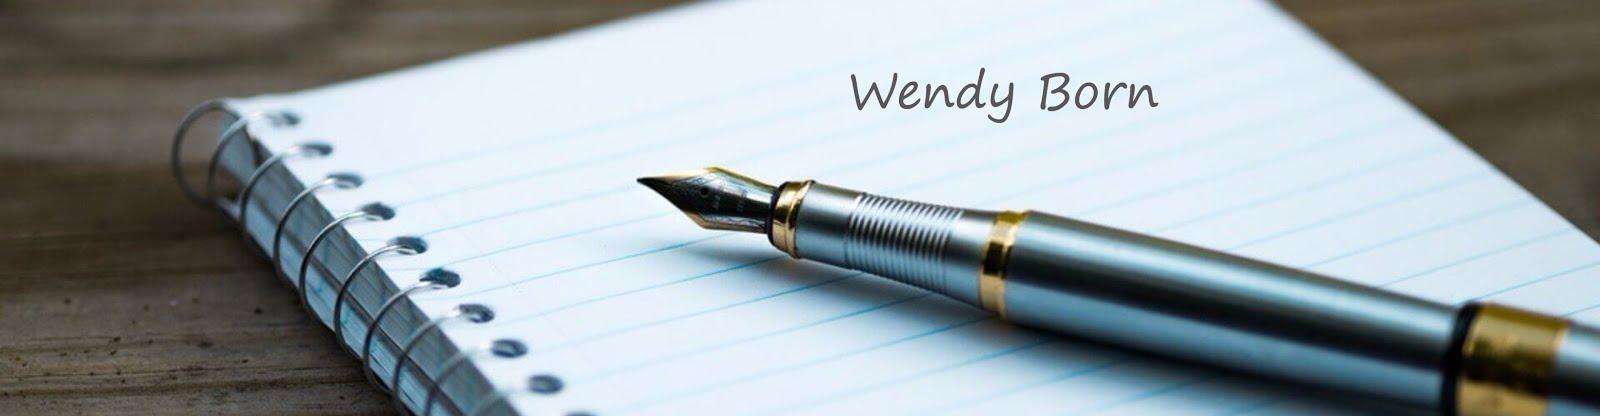 Wendy Born